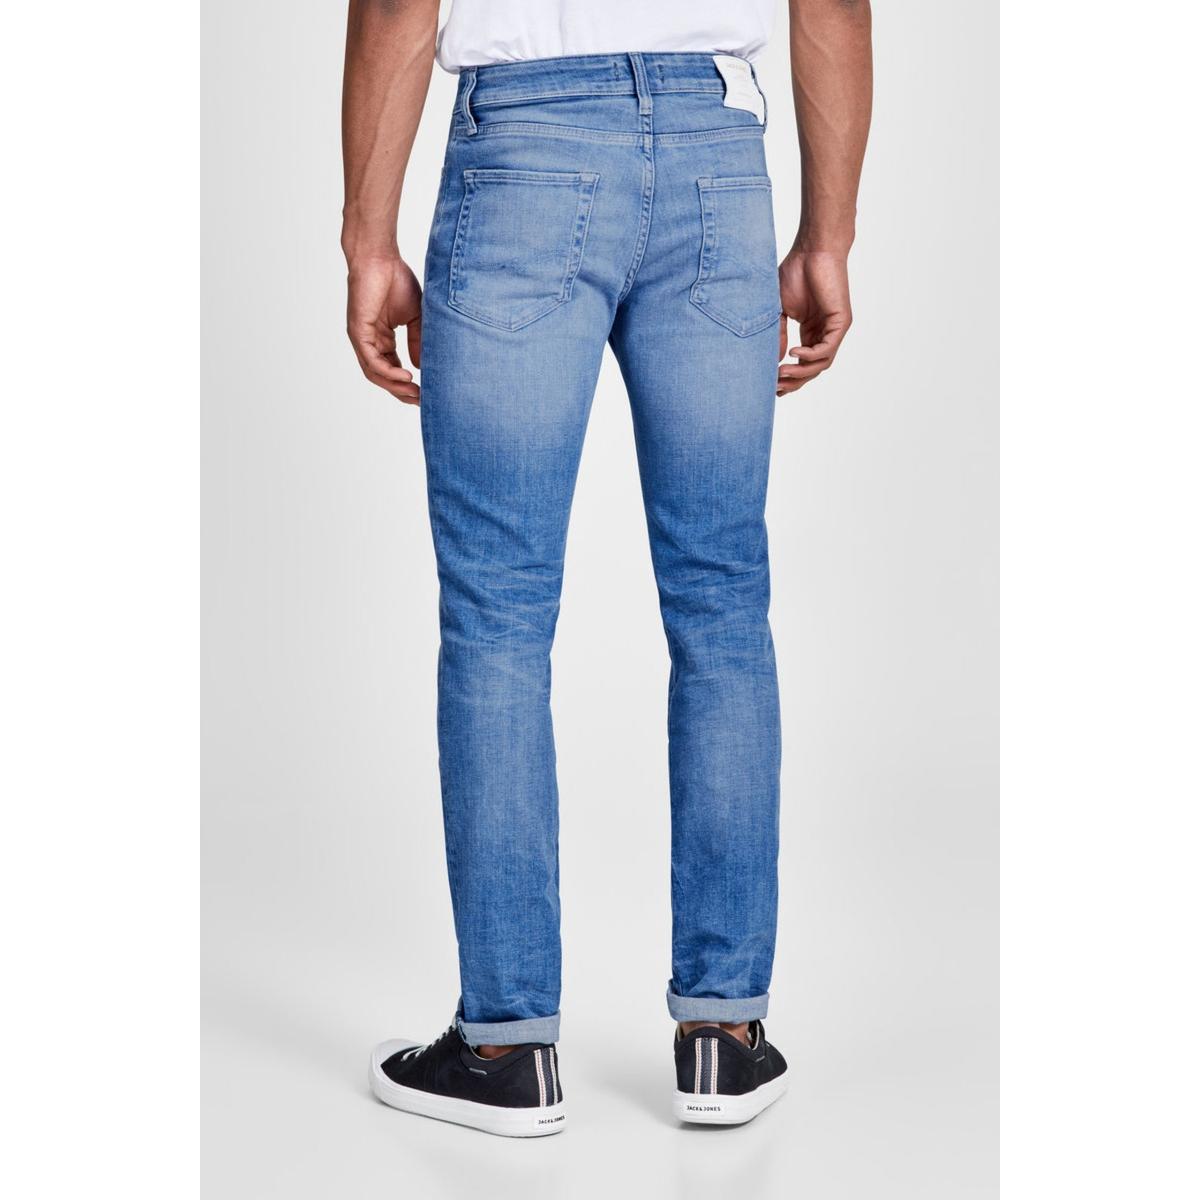 jjitim jjicon jj 099 noos 12136470 jack & jones jeans blue denim